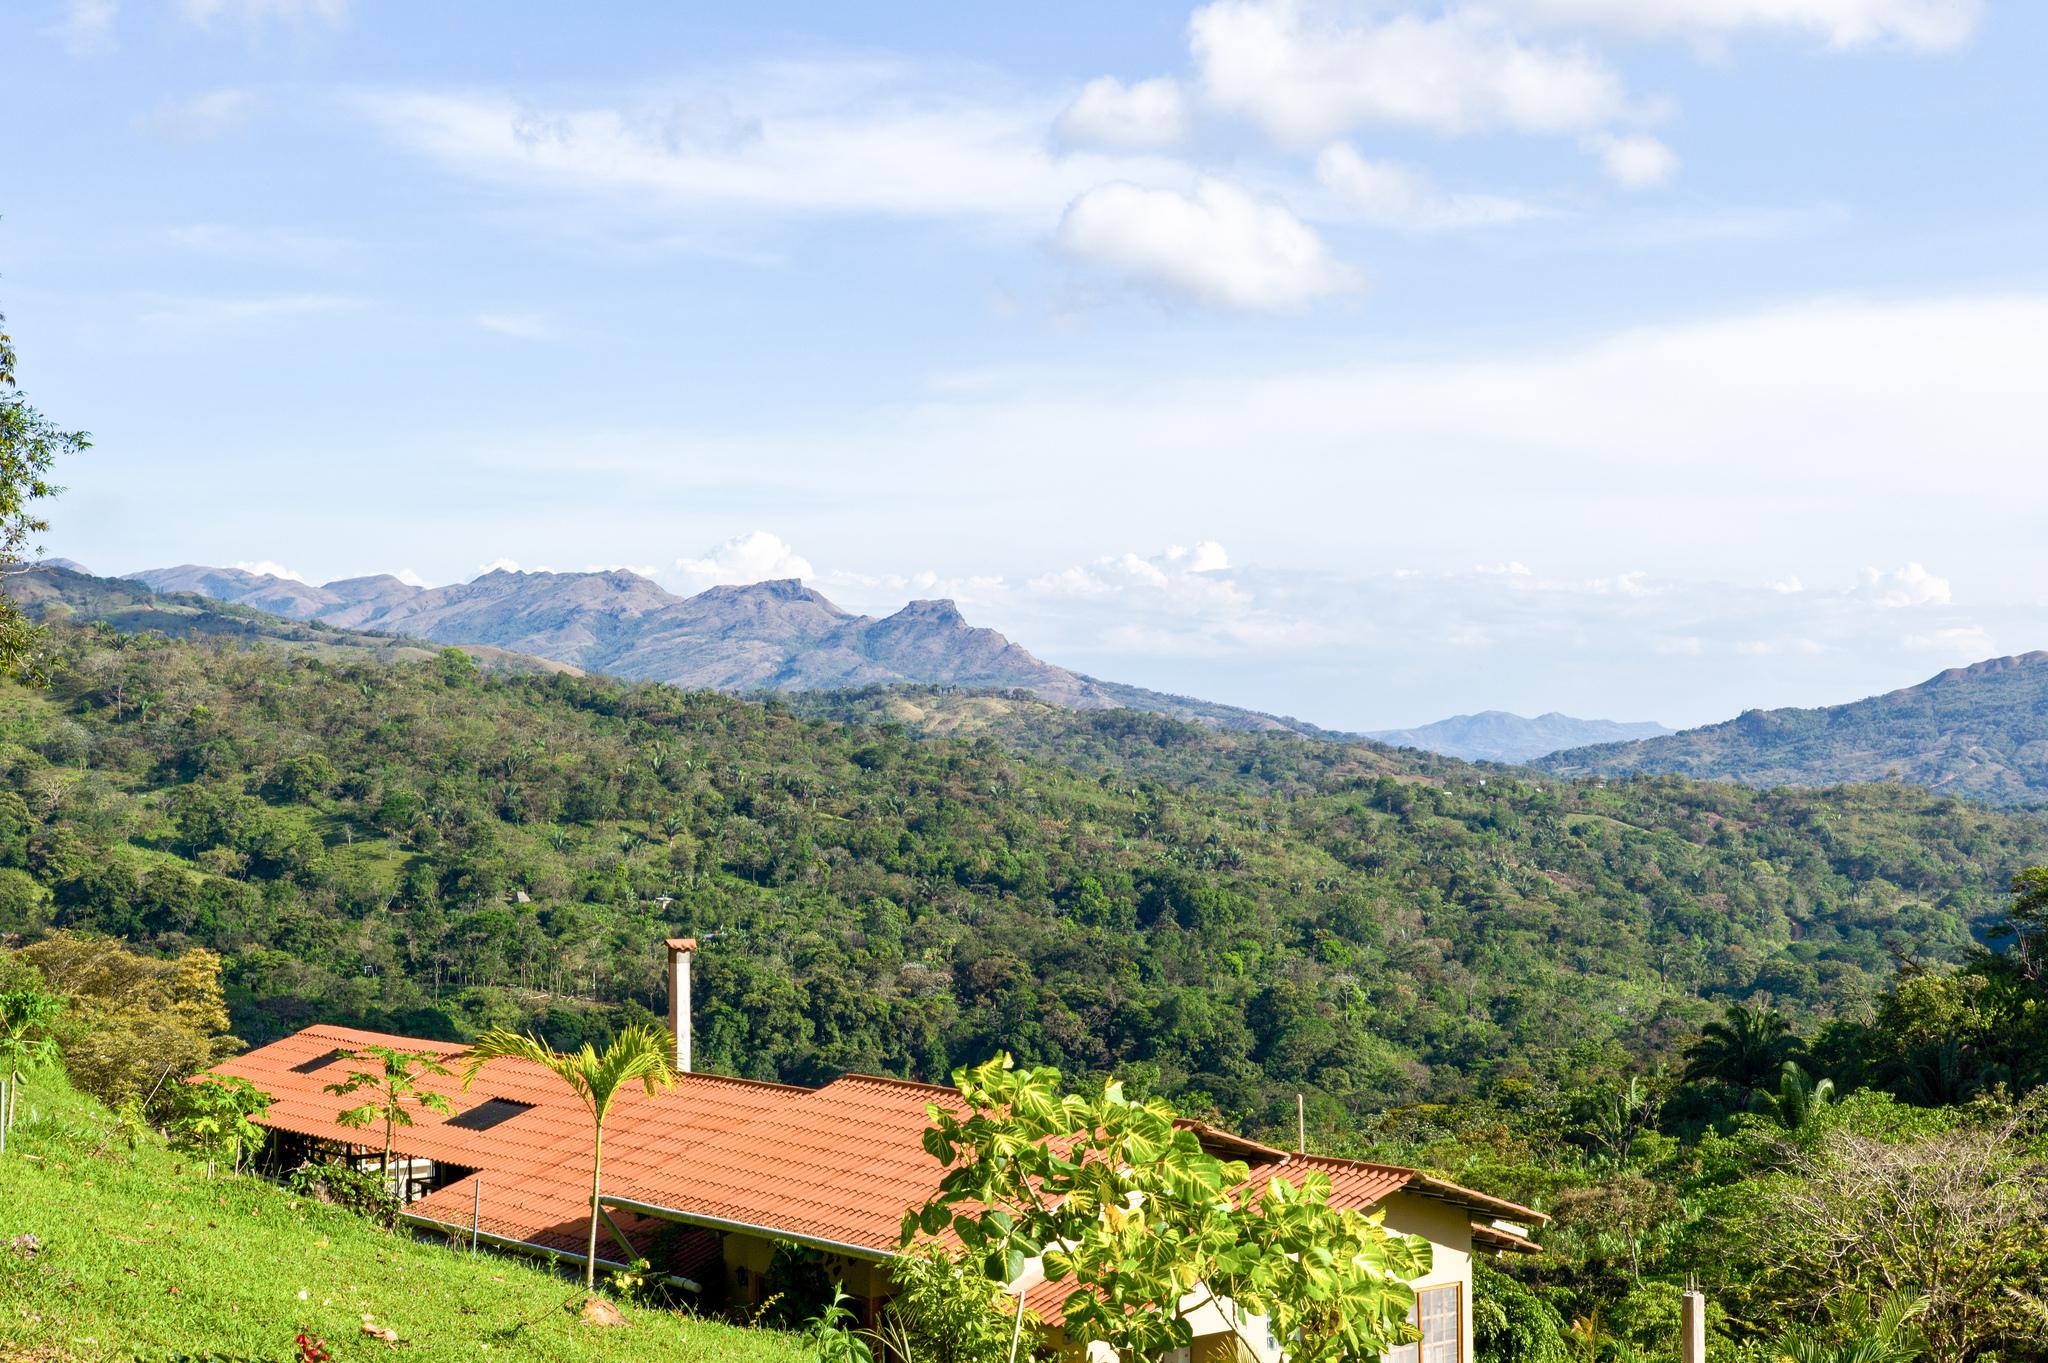 Reinventing Ourselves as Coffee Farmers in Veraguas